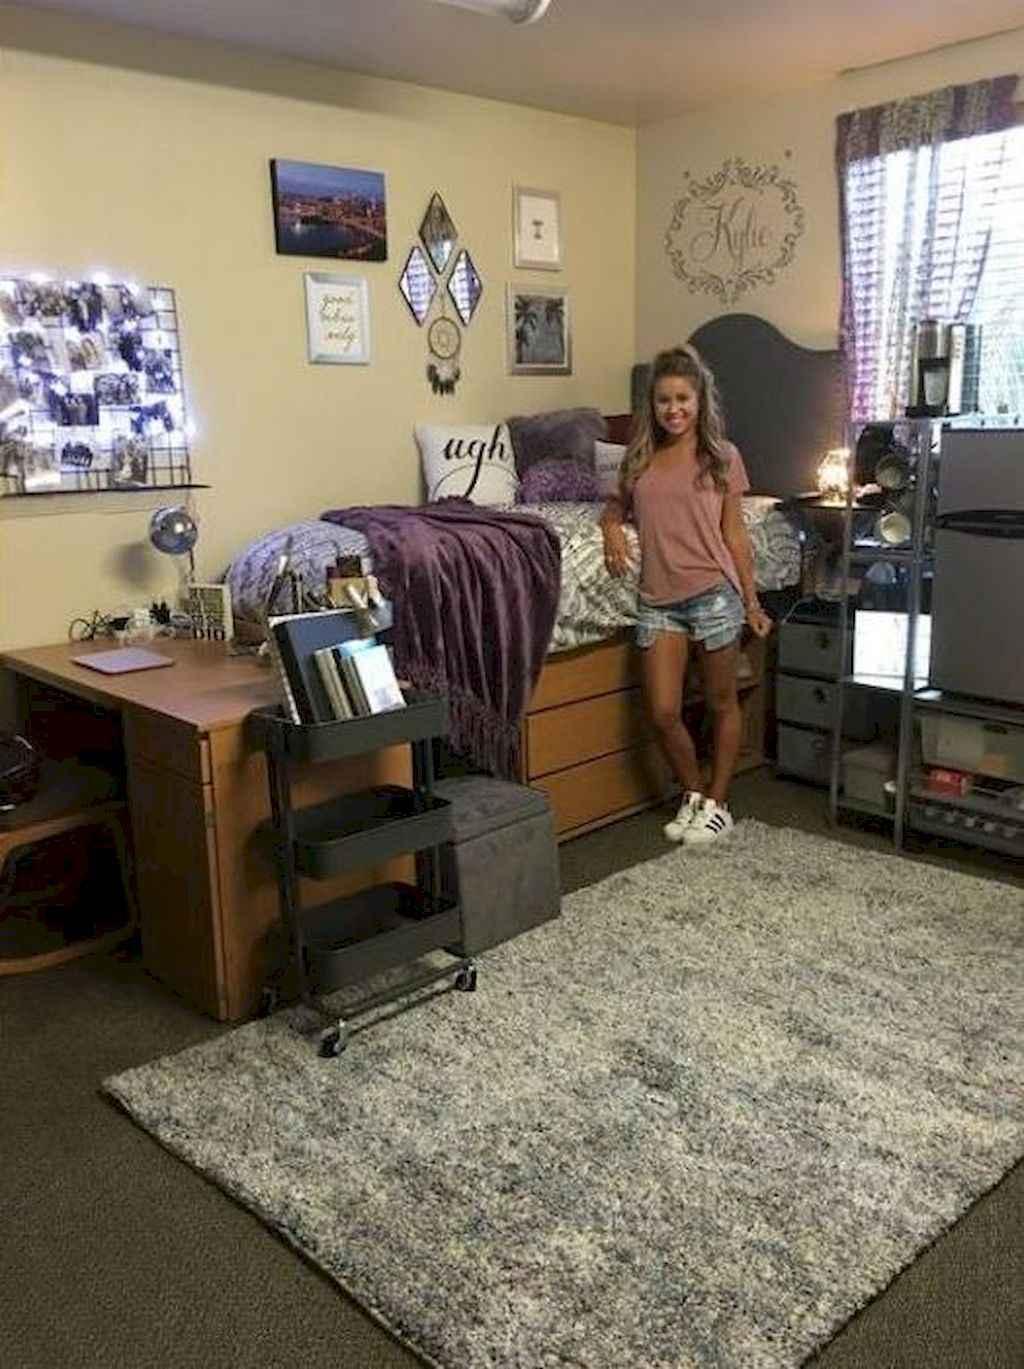 Cute diy dorm room decorating ideas on a budget (9)